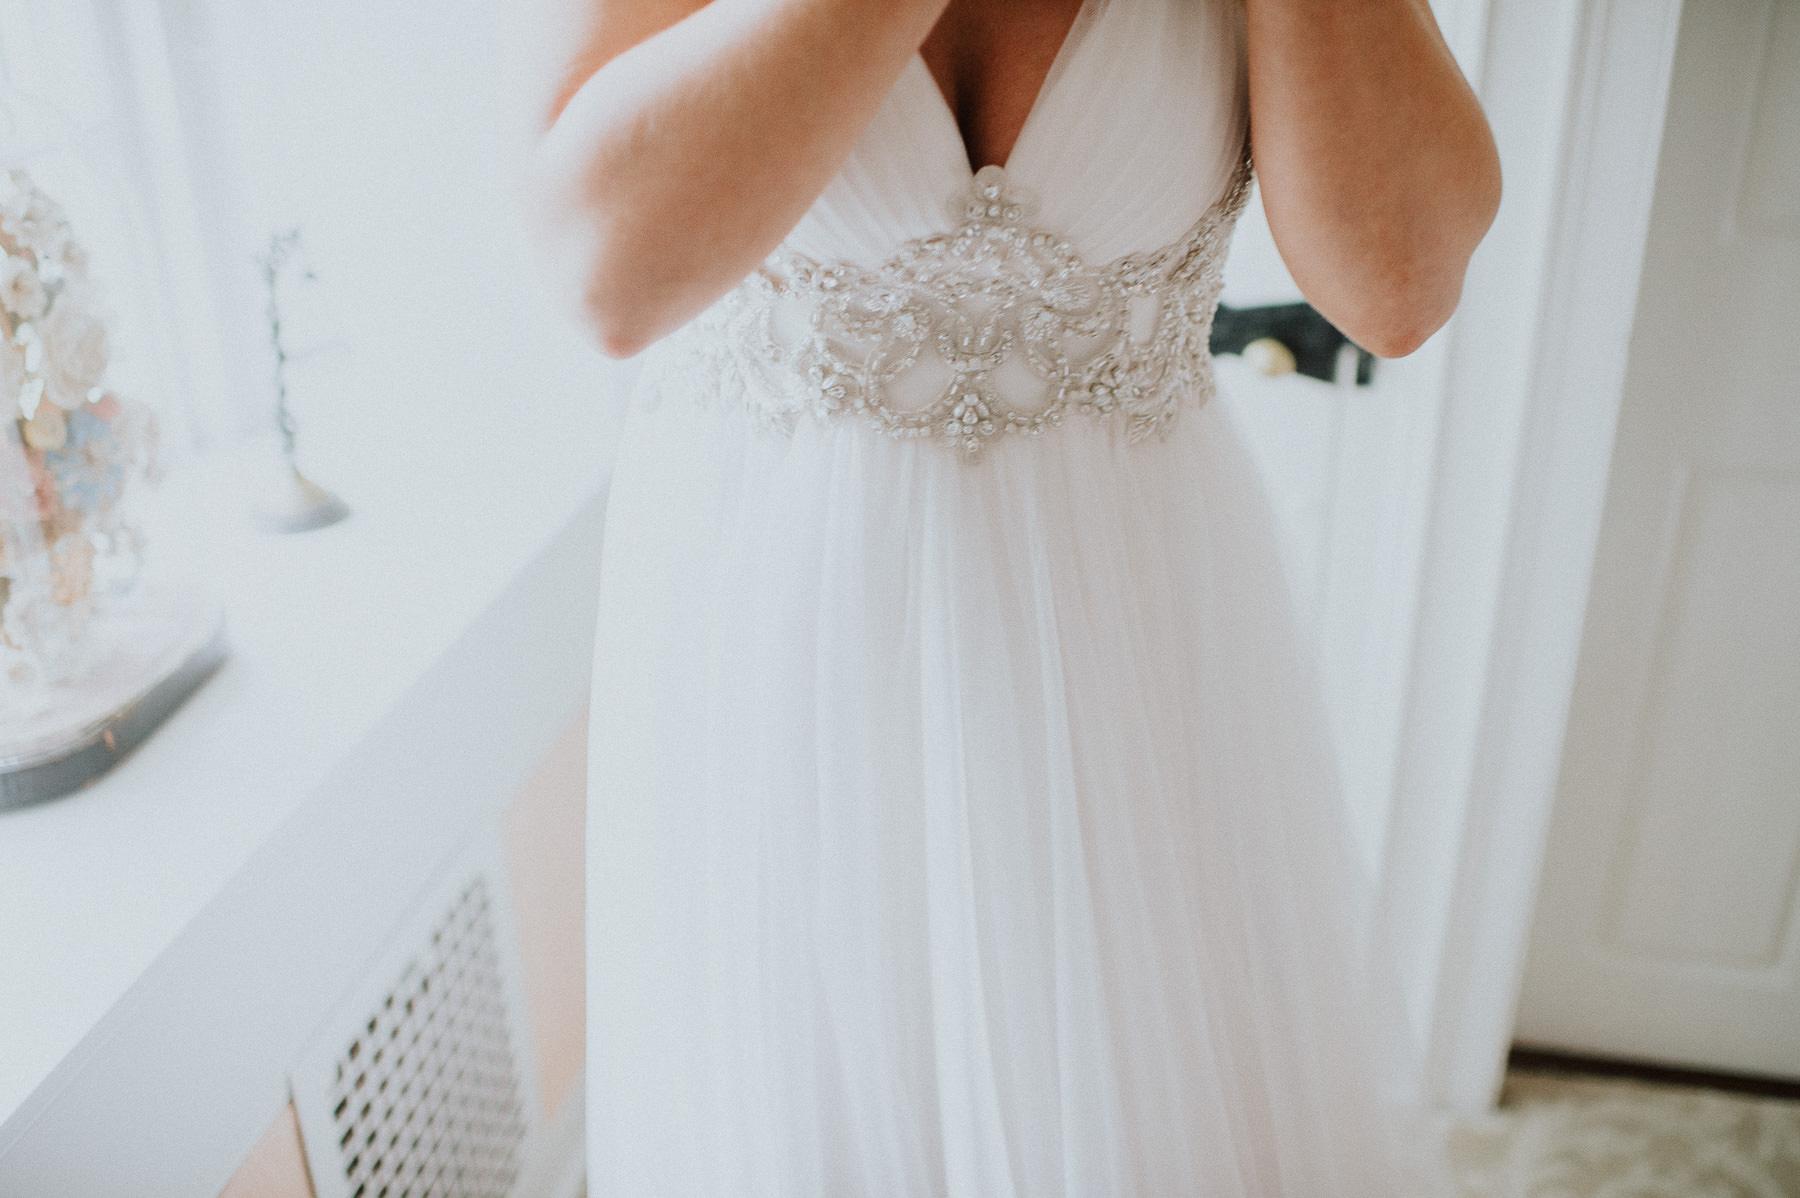 appleford-estate-wedding-photography-19.jpg